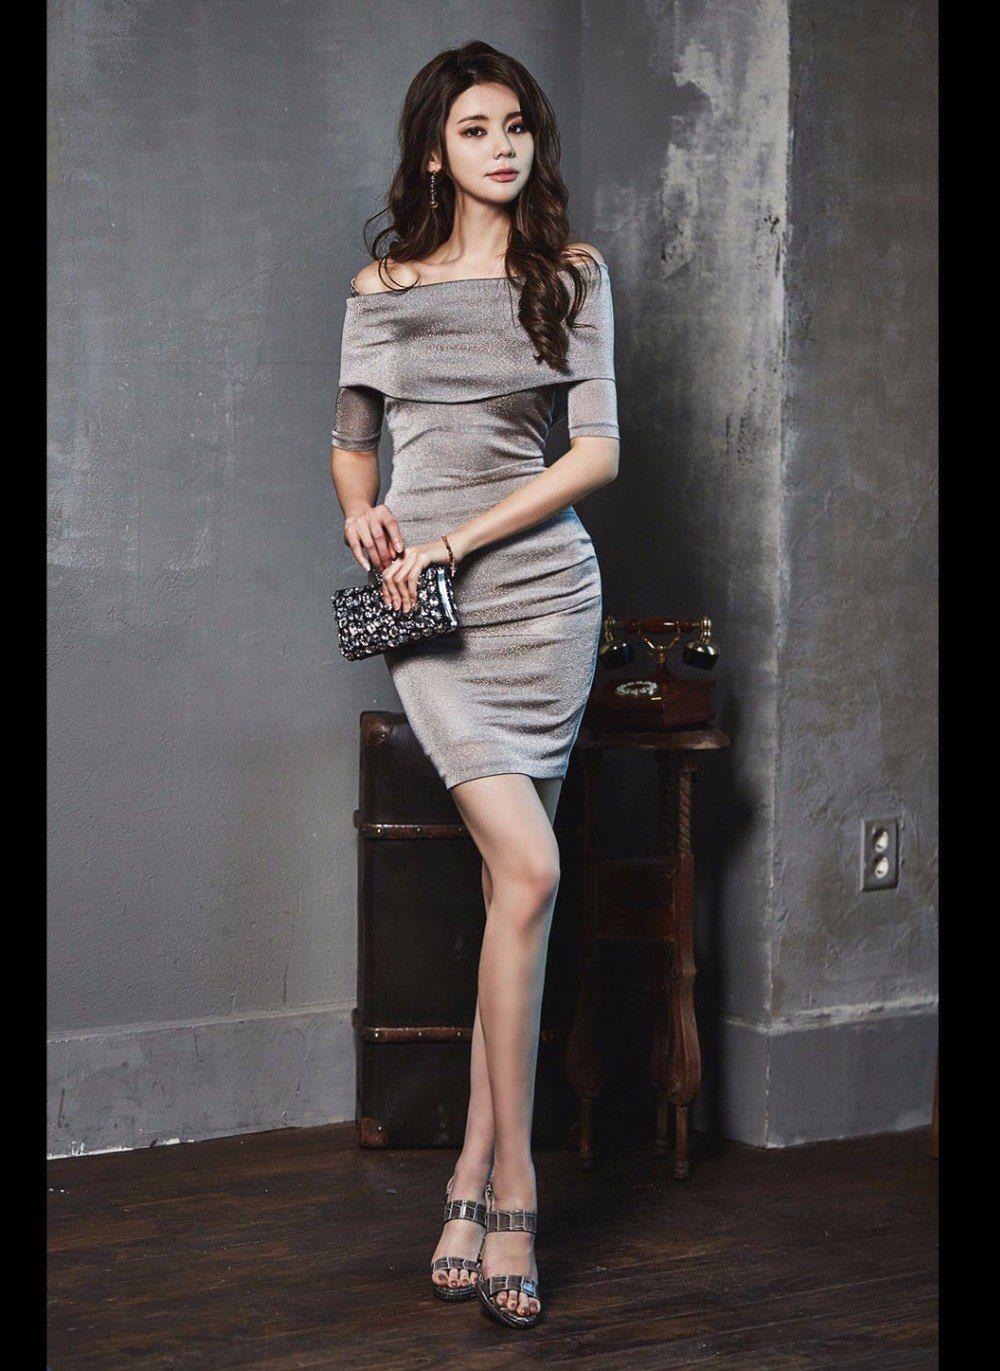 85b5b7f582886 Korean Women Silver Dress Pinkup Off Shoulder Bodycon Mini Night Club Dress  To Party Robe Sexy